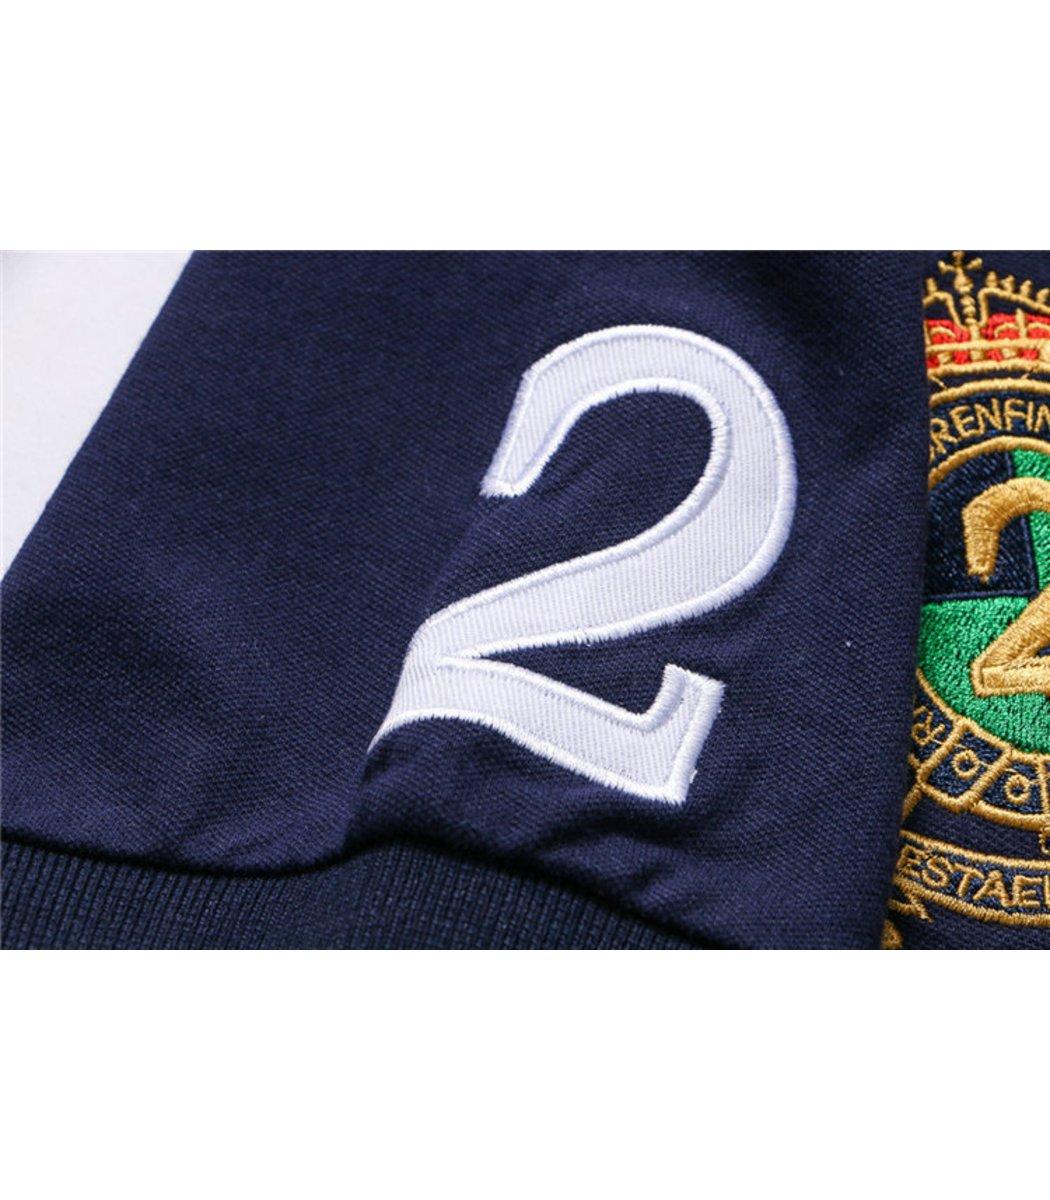 Мужская Темно-синяя футболка поло Ralph Lauren R7